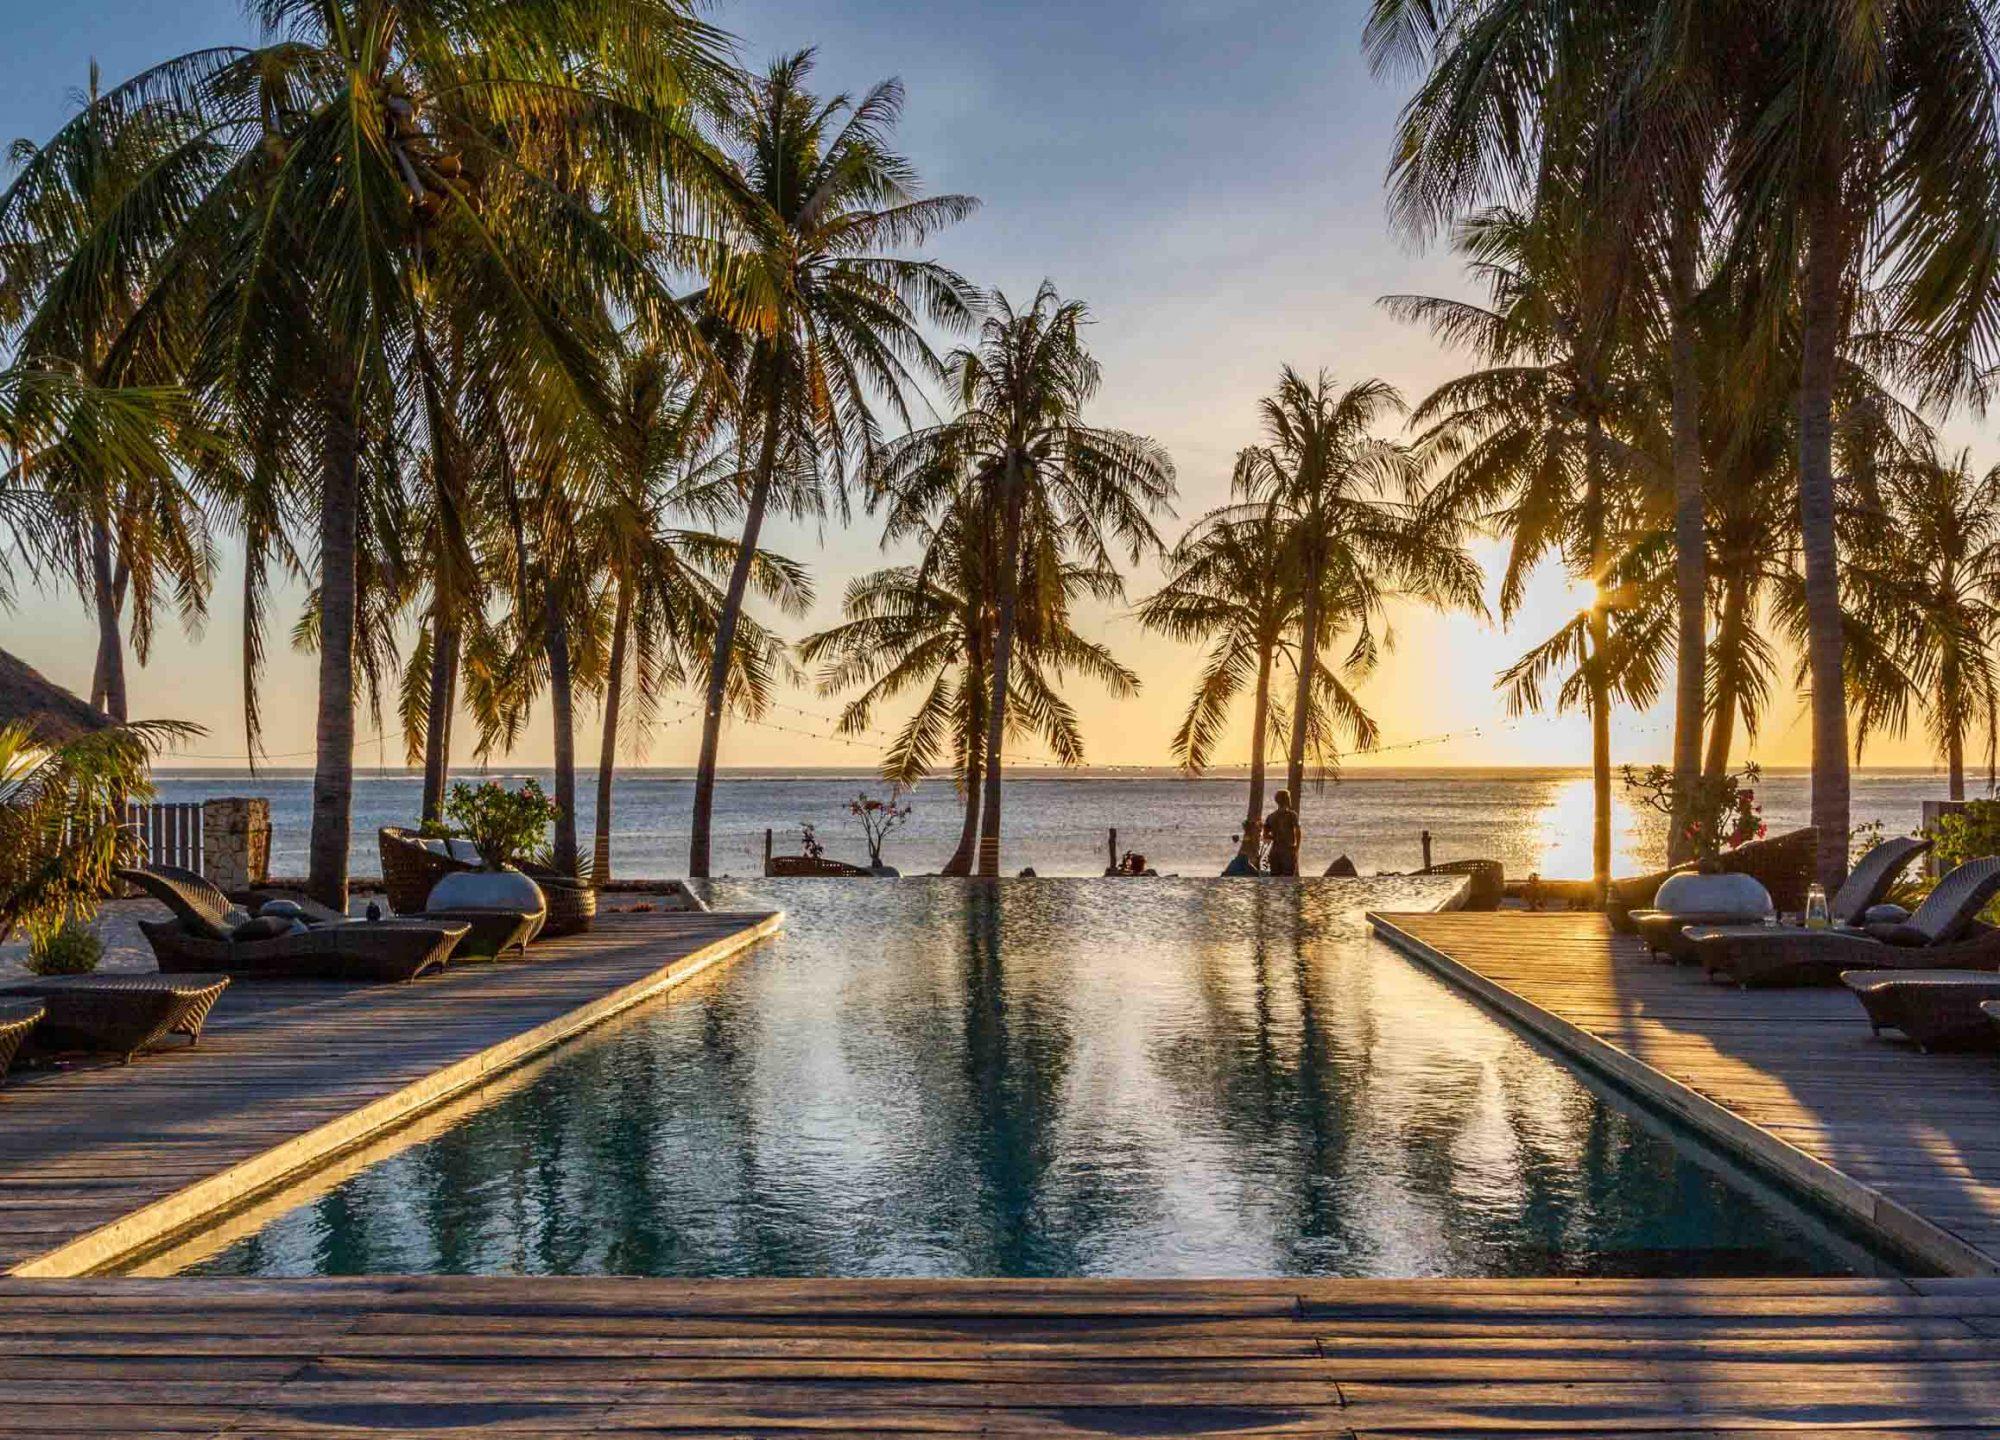 Pool seed resort